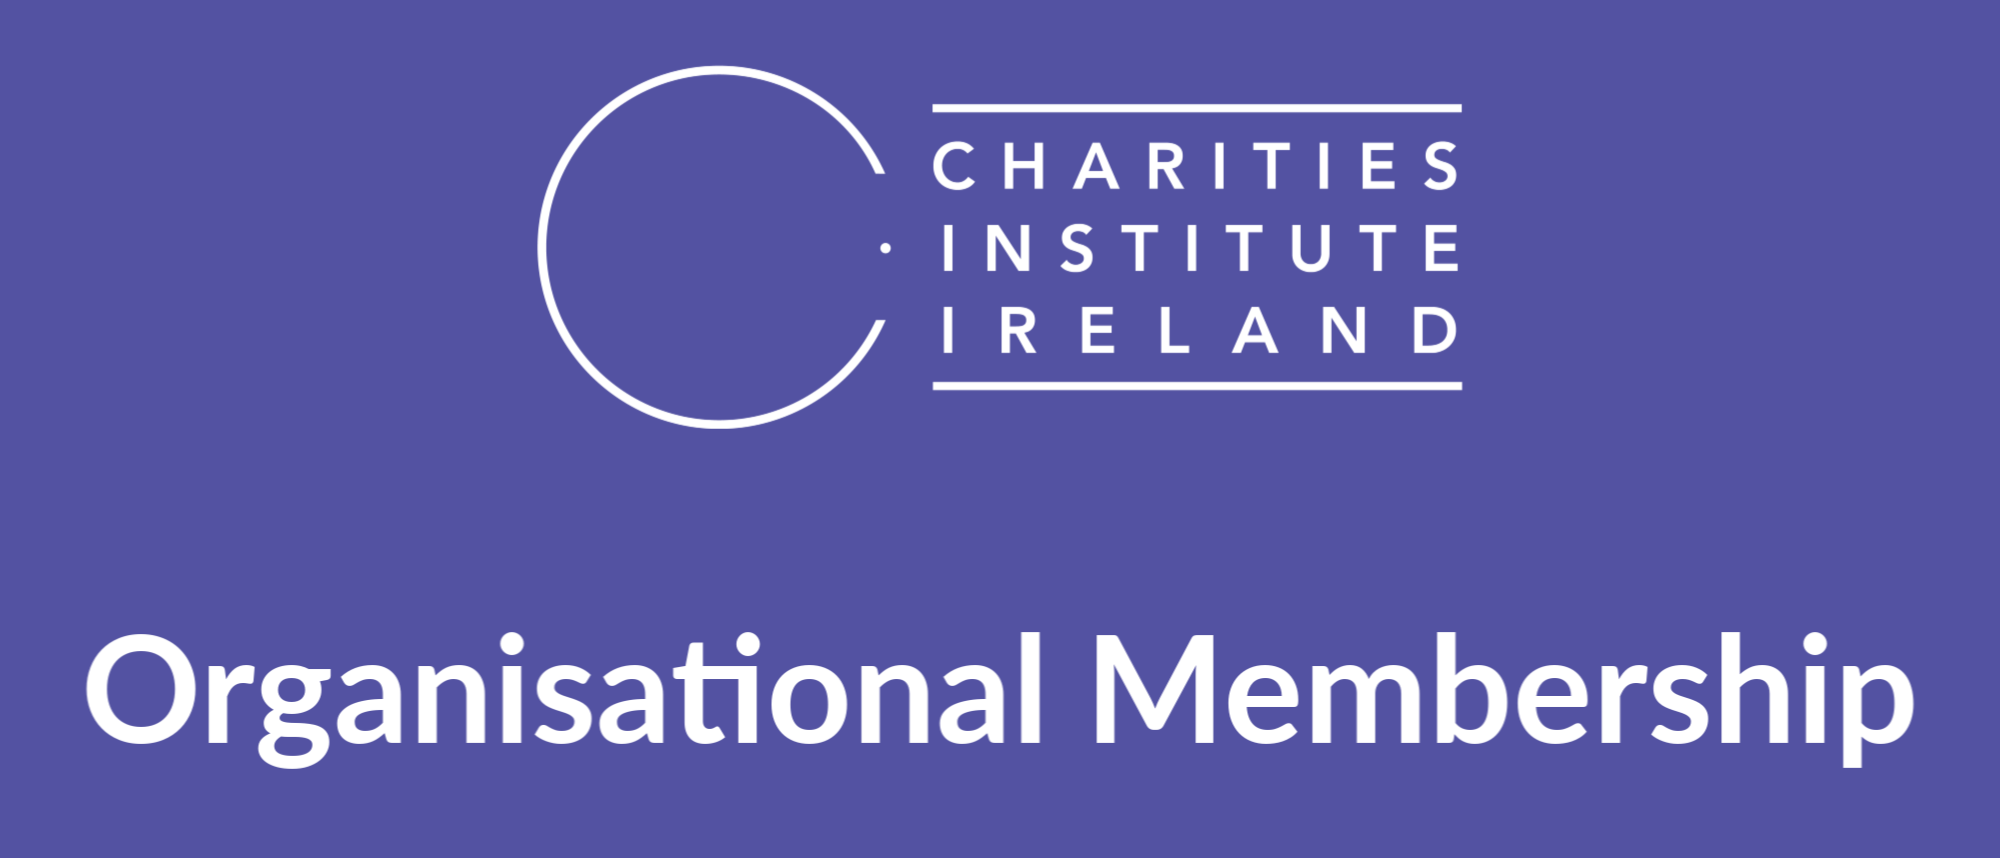 Charities Institute Ireland Membership.png